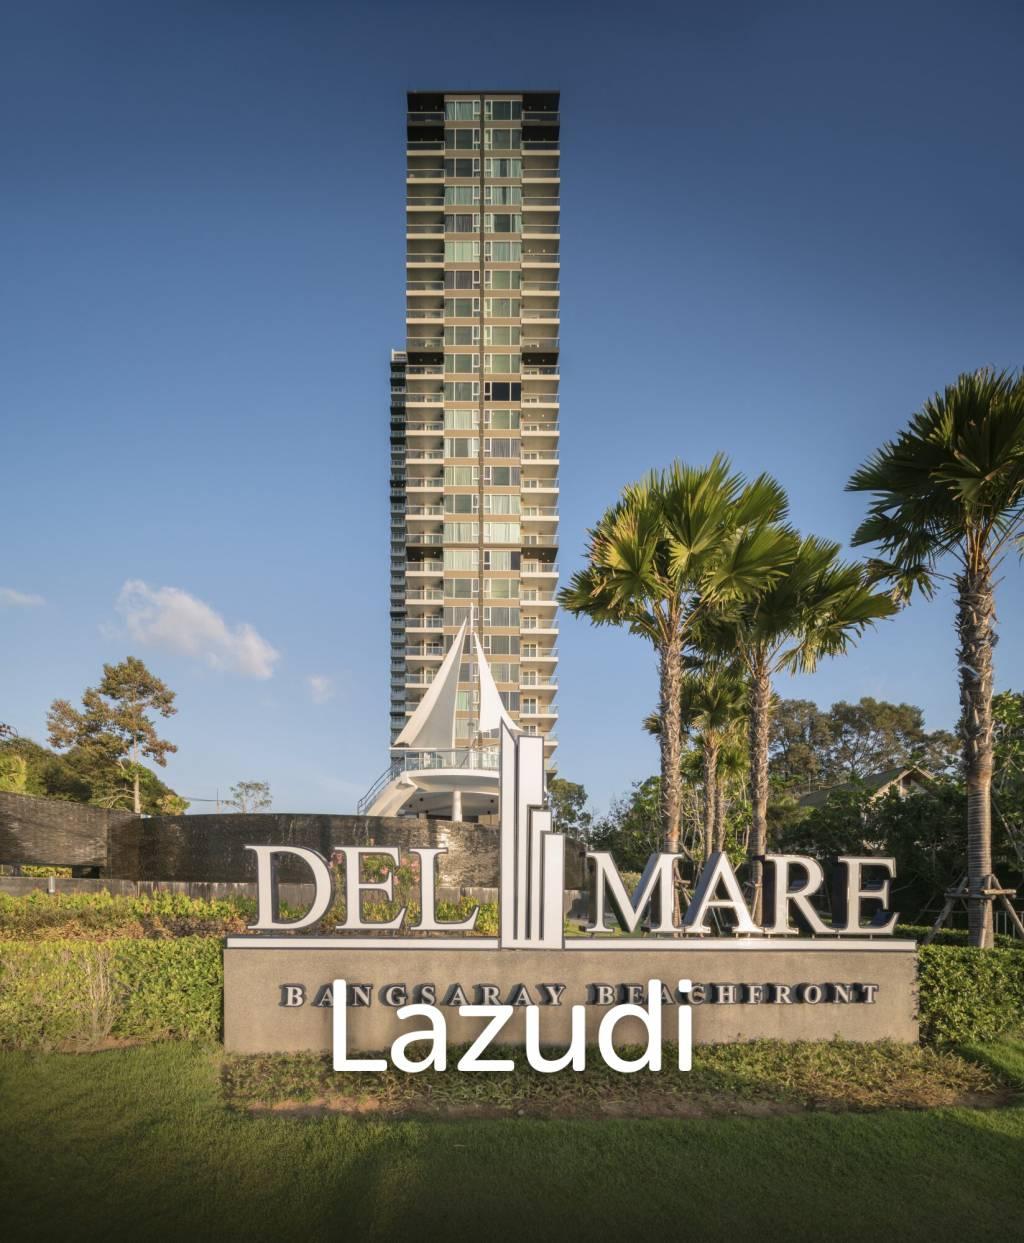 Del Mare Bangsaray Condominium